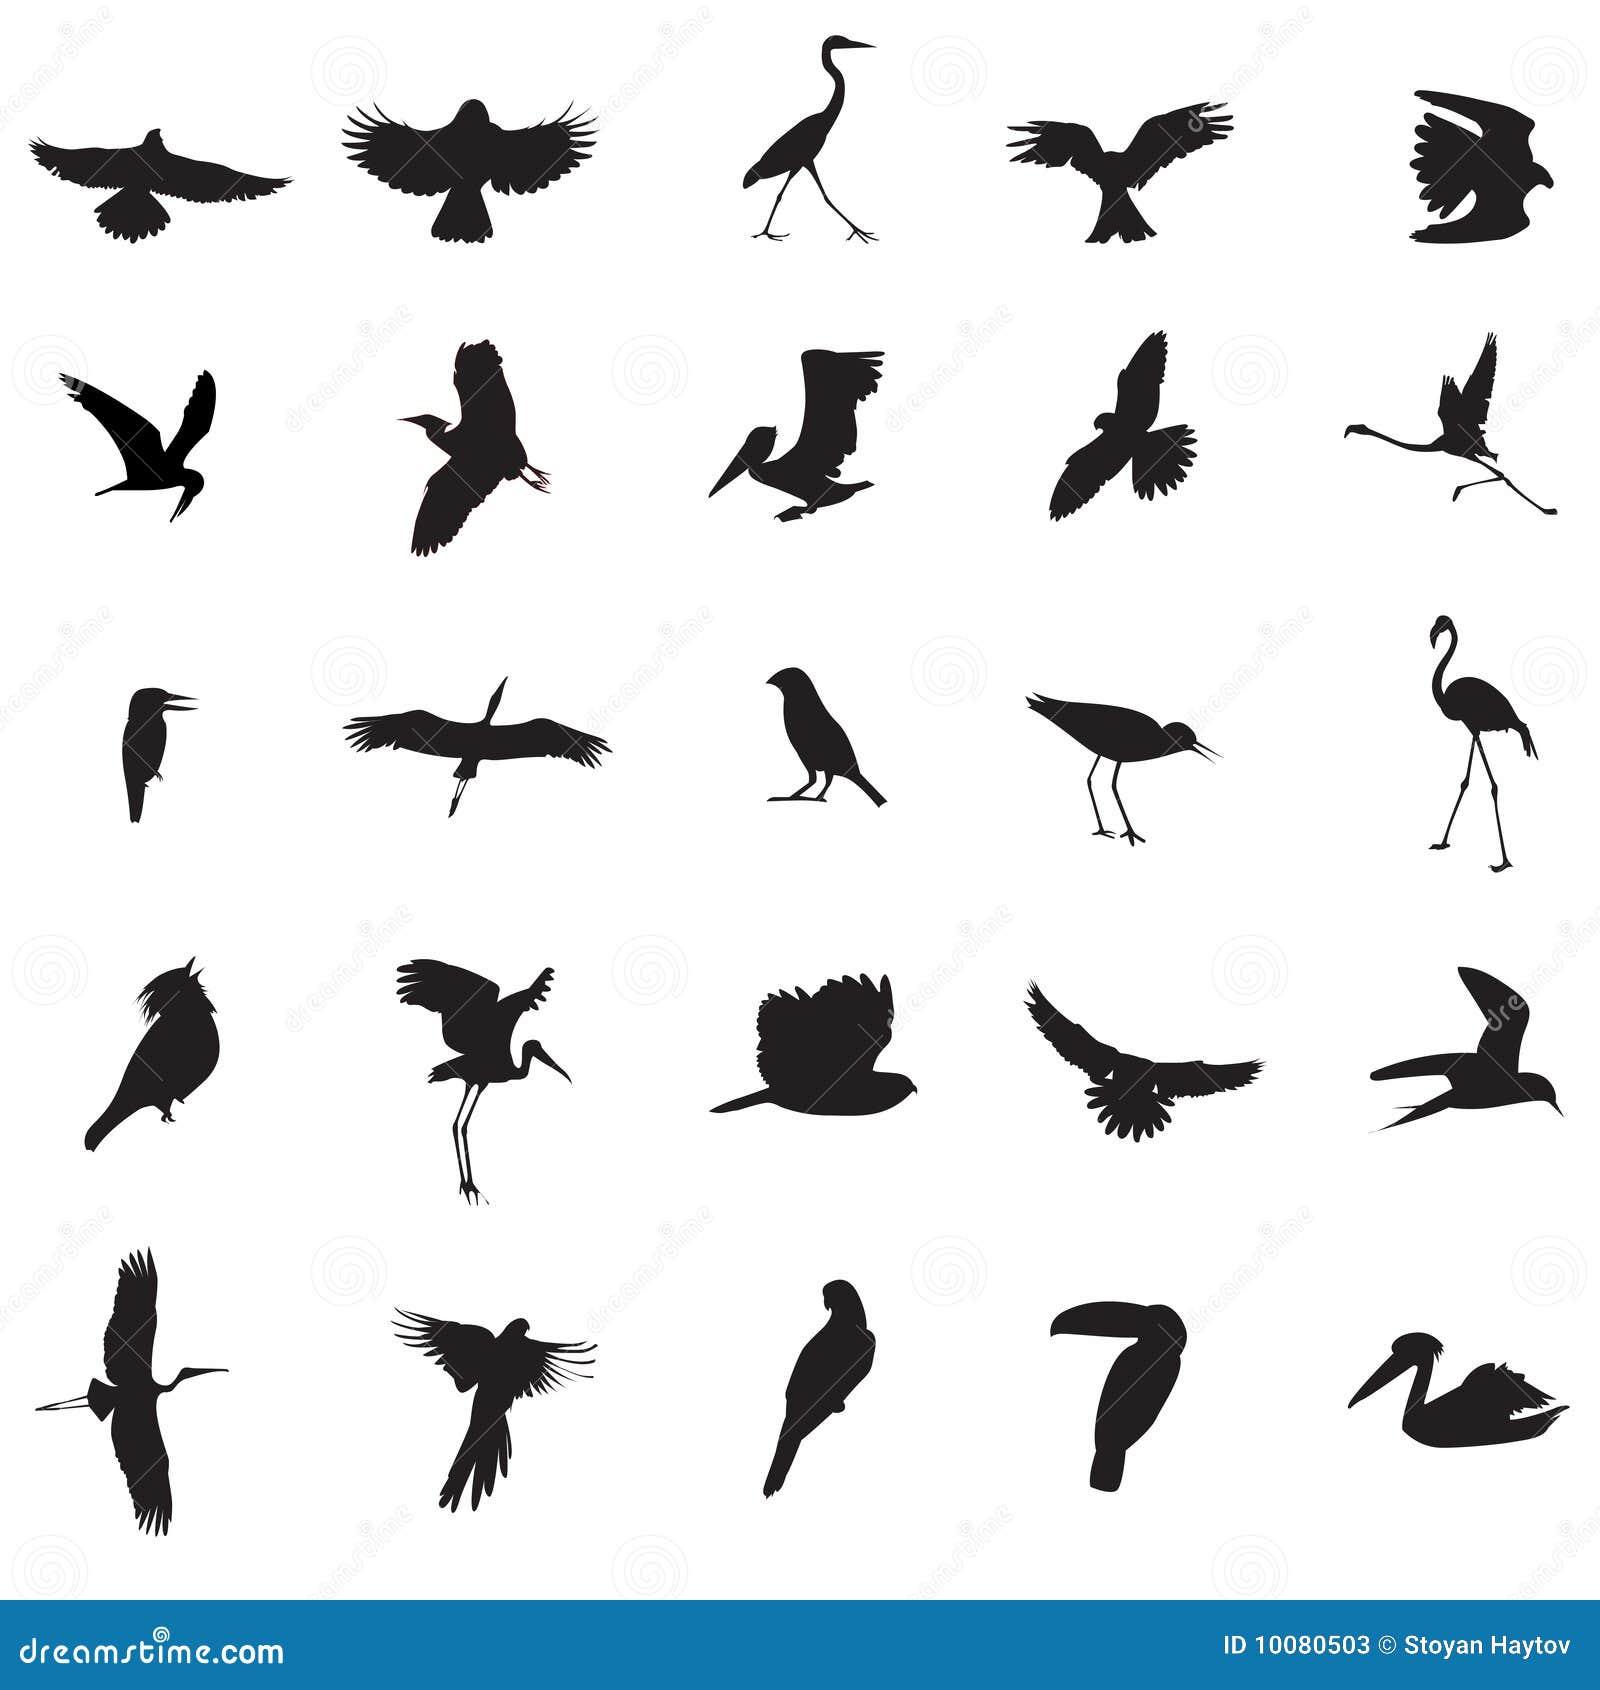 Bird Illustrations Stock Photos Image 10080503